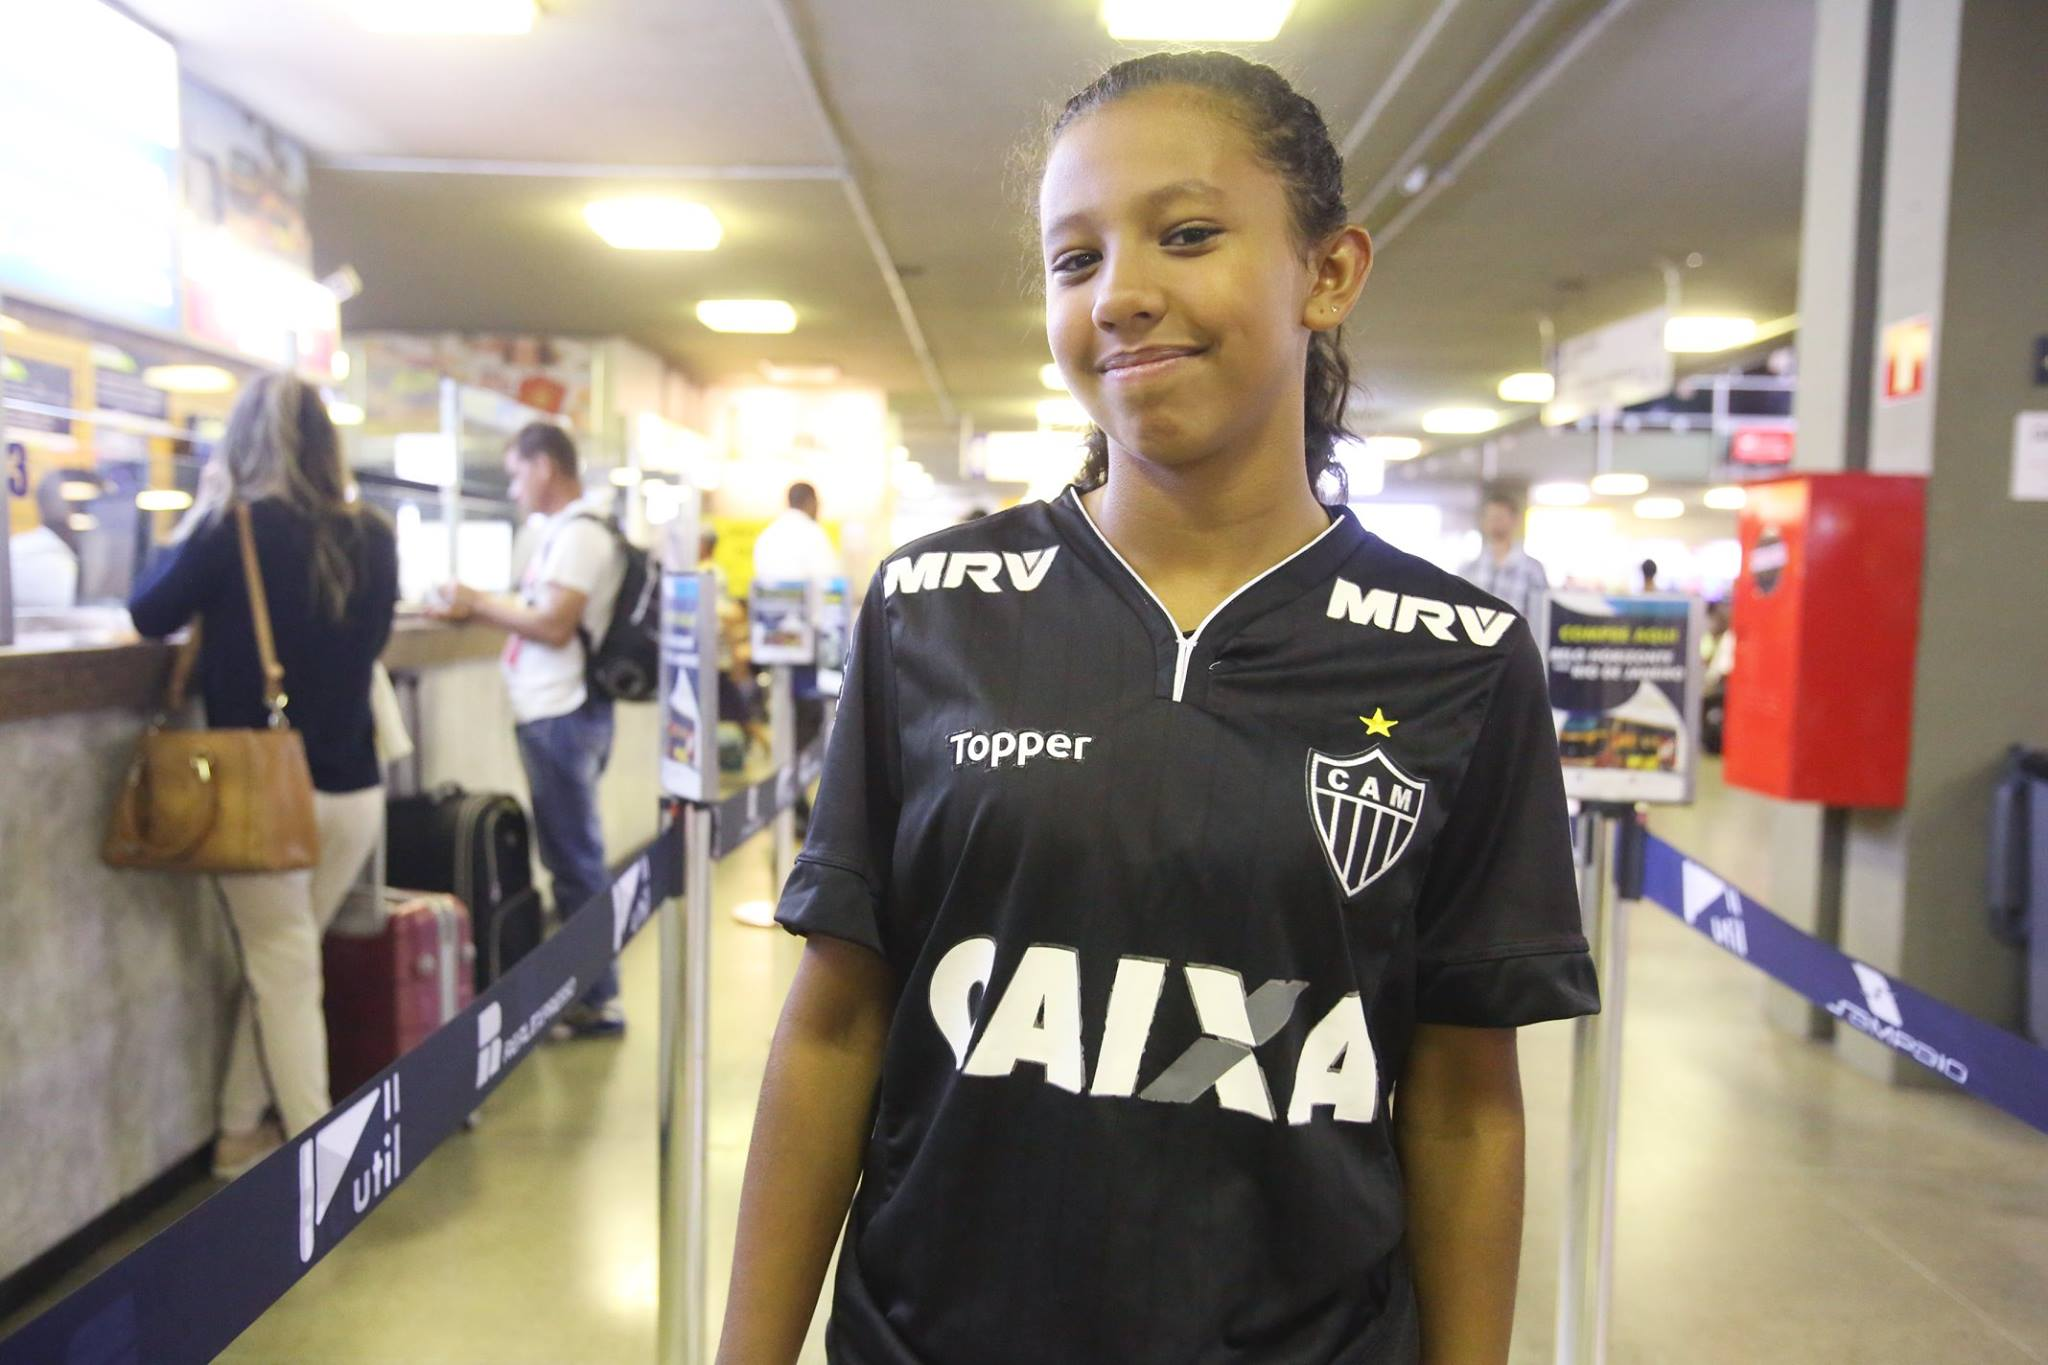 Leticia - Clube Atlético Mineiro